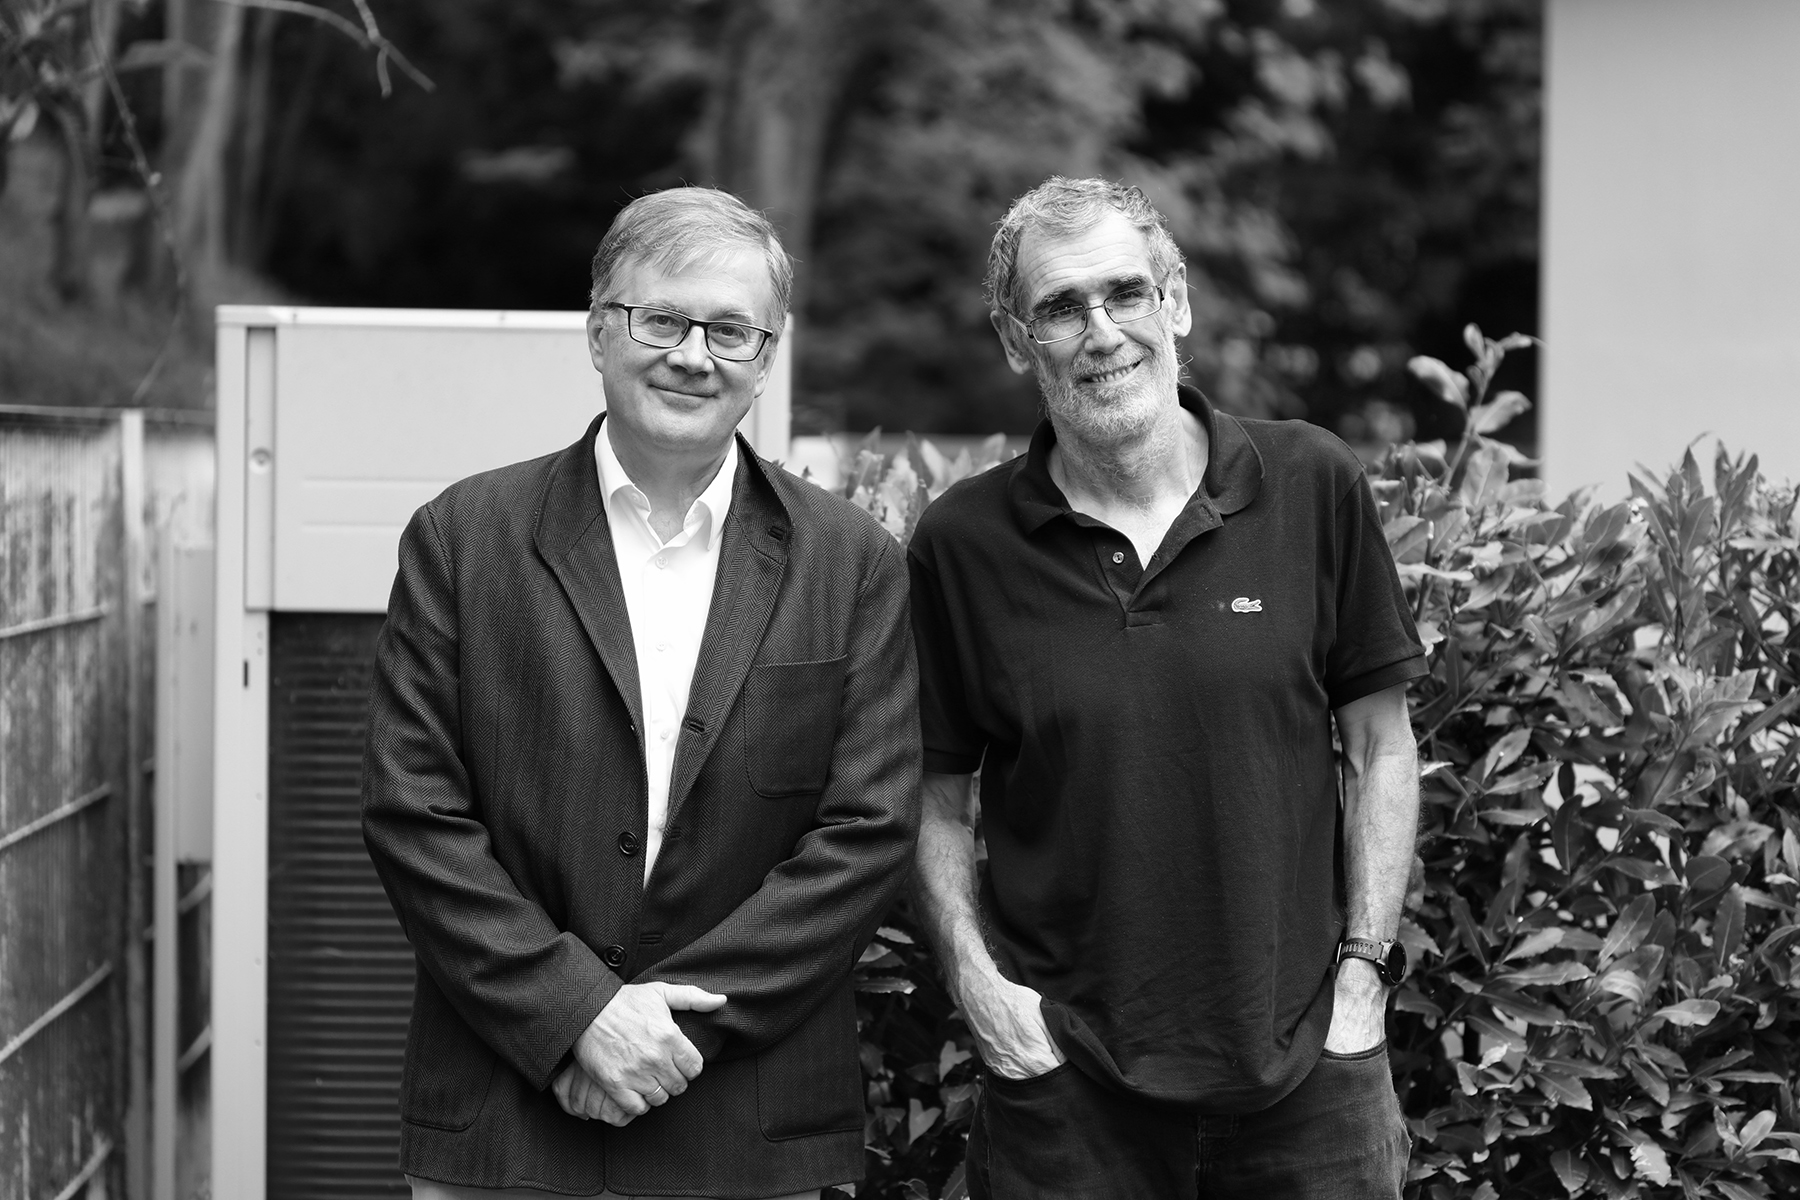 Fernando Cossío y Juanjo Gómez Cárdenas. Foto: Ángel Fernández